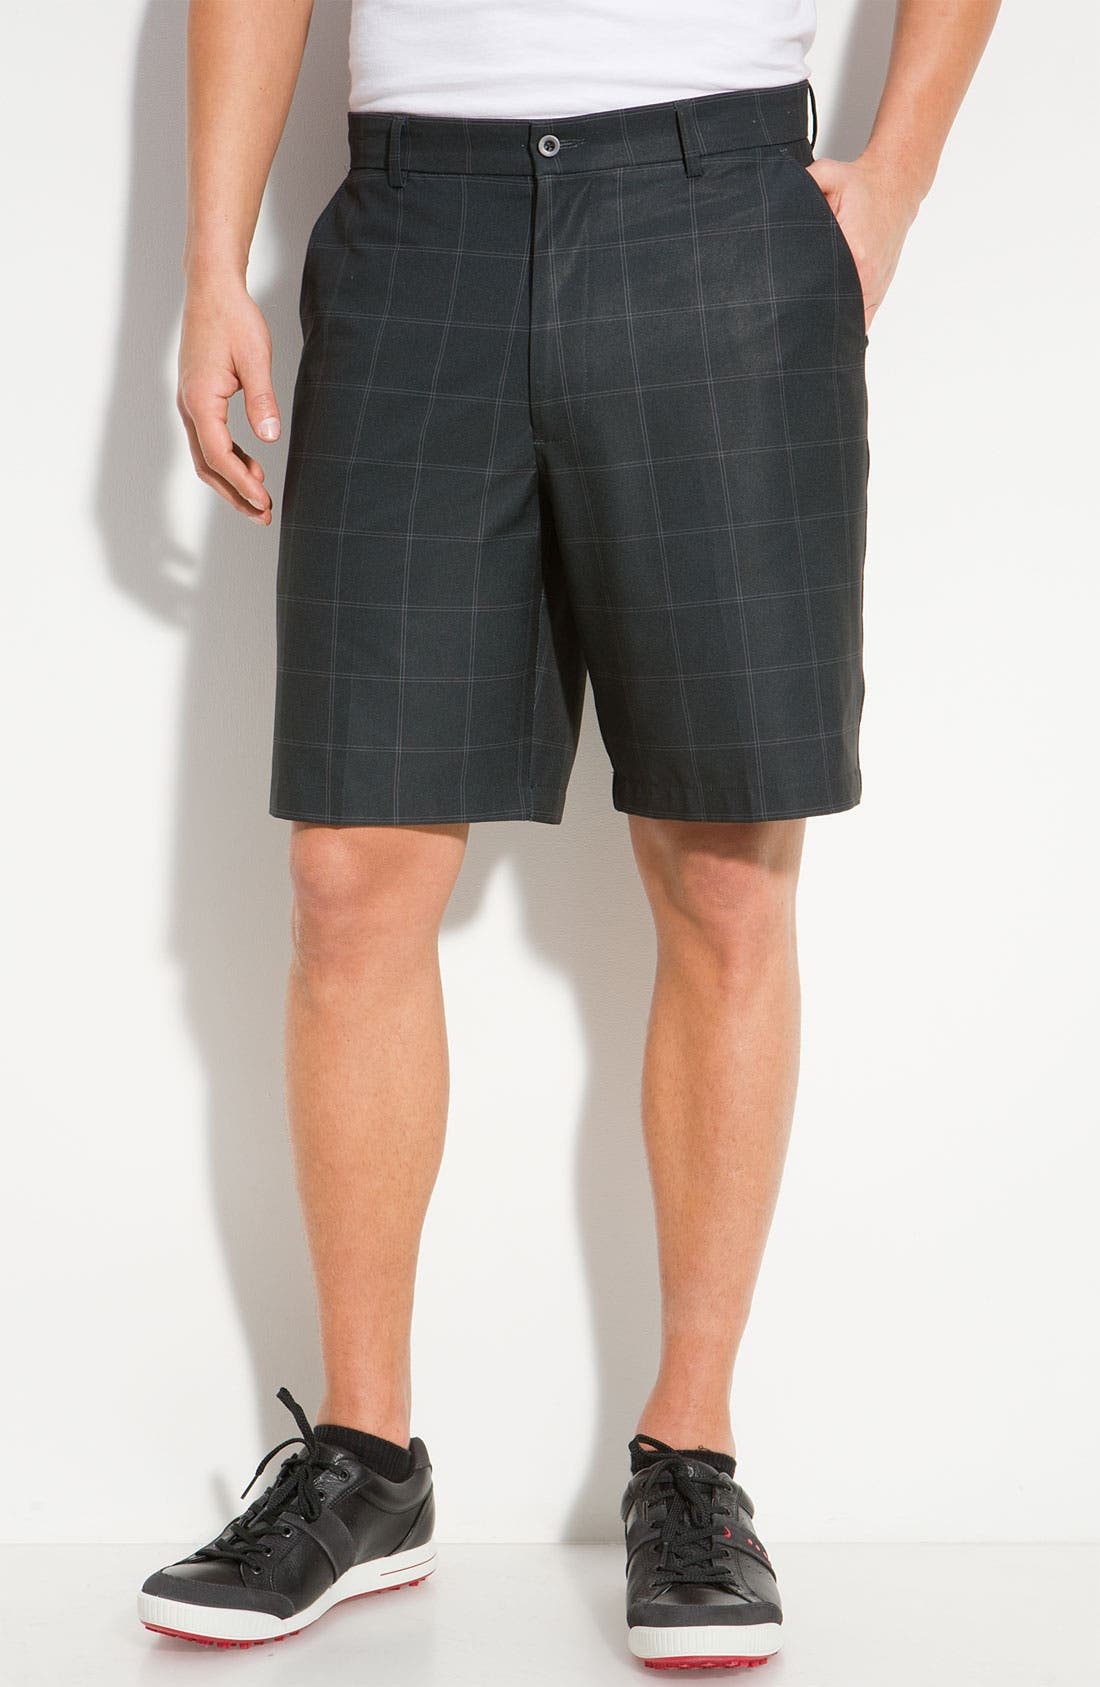 Alternate Image 1 Selected - Lone Cypress Pebble Beach Plaid Golf Shorts